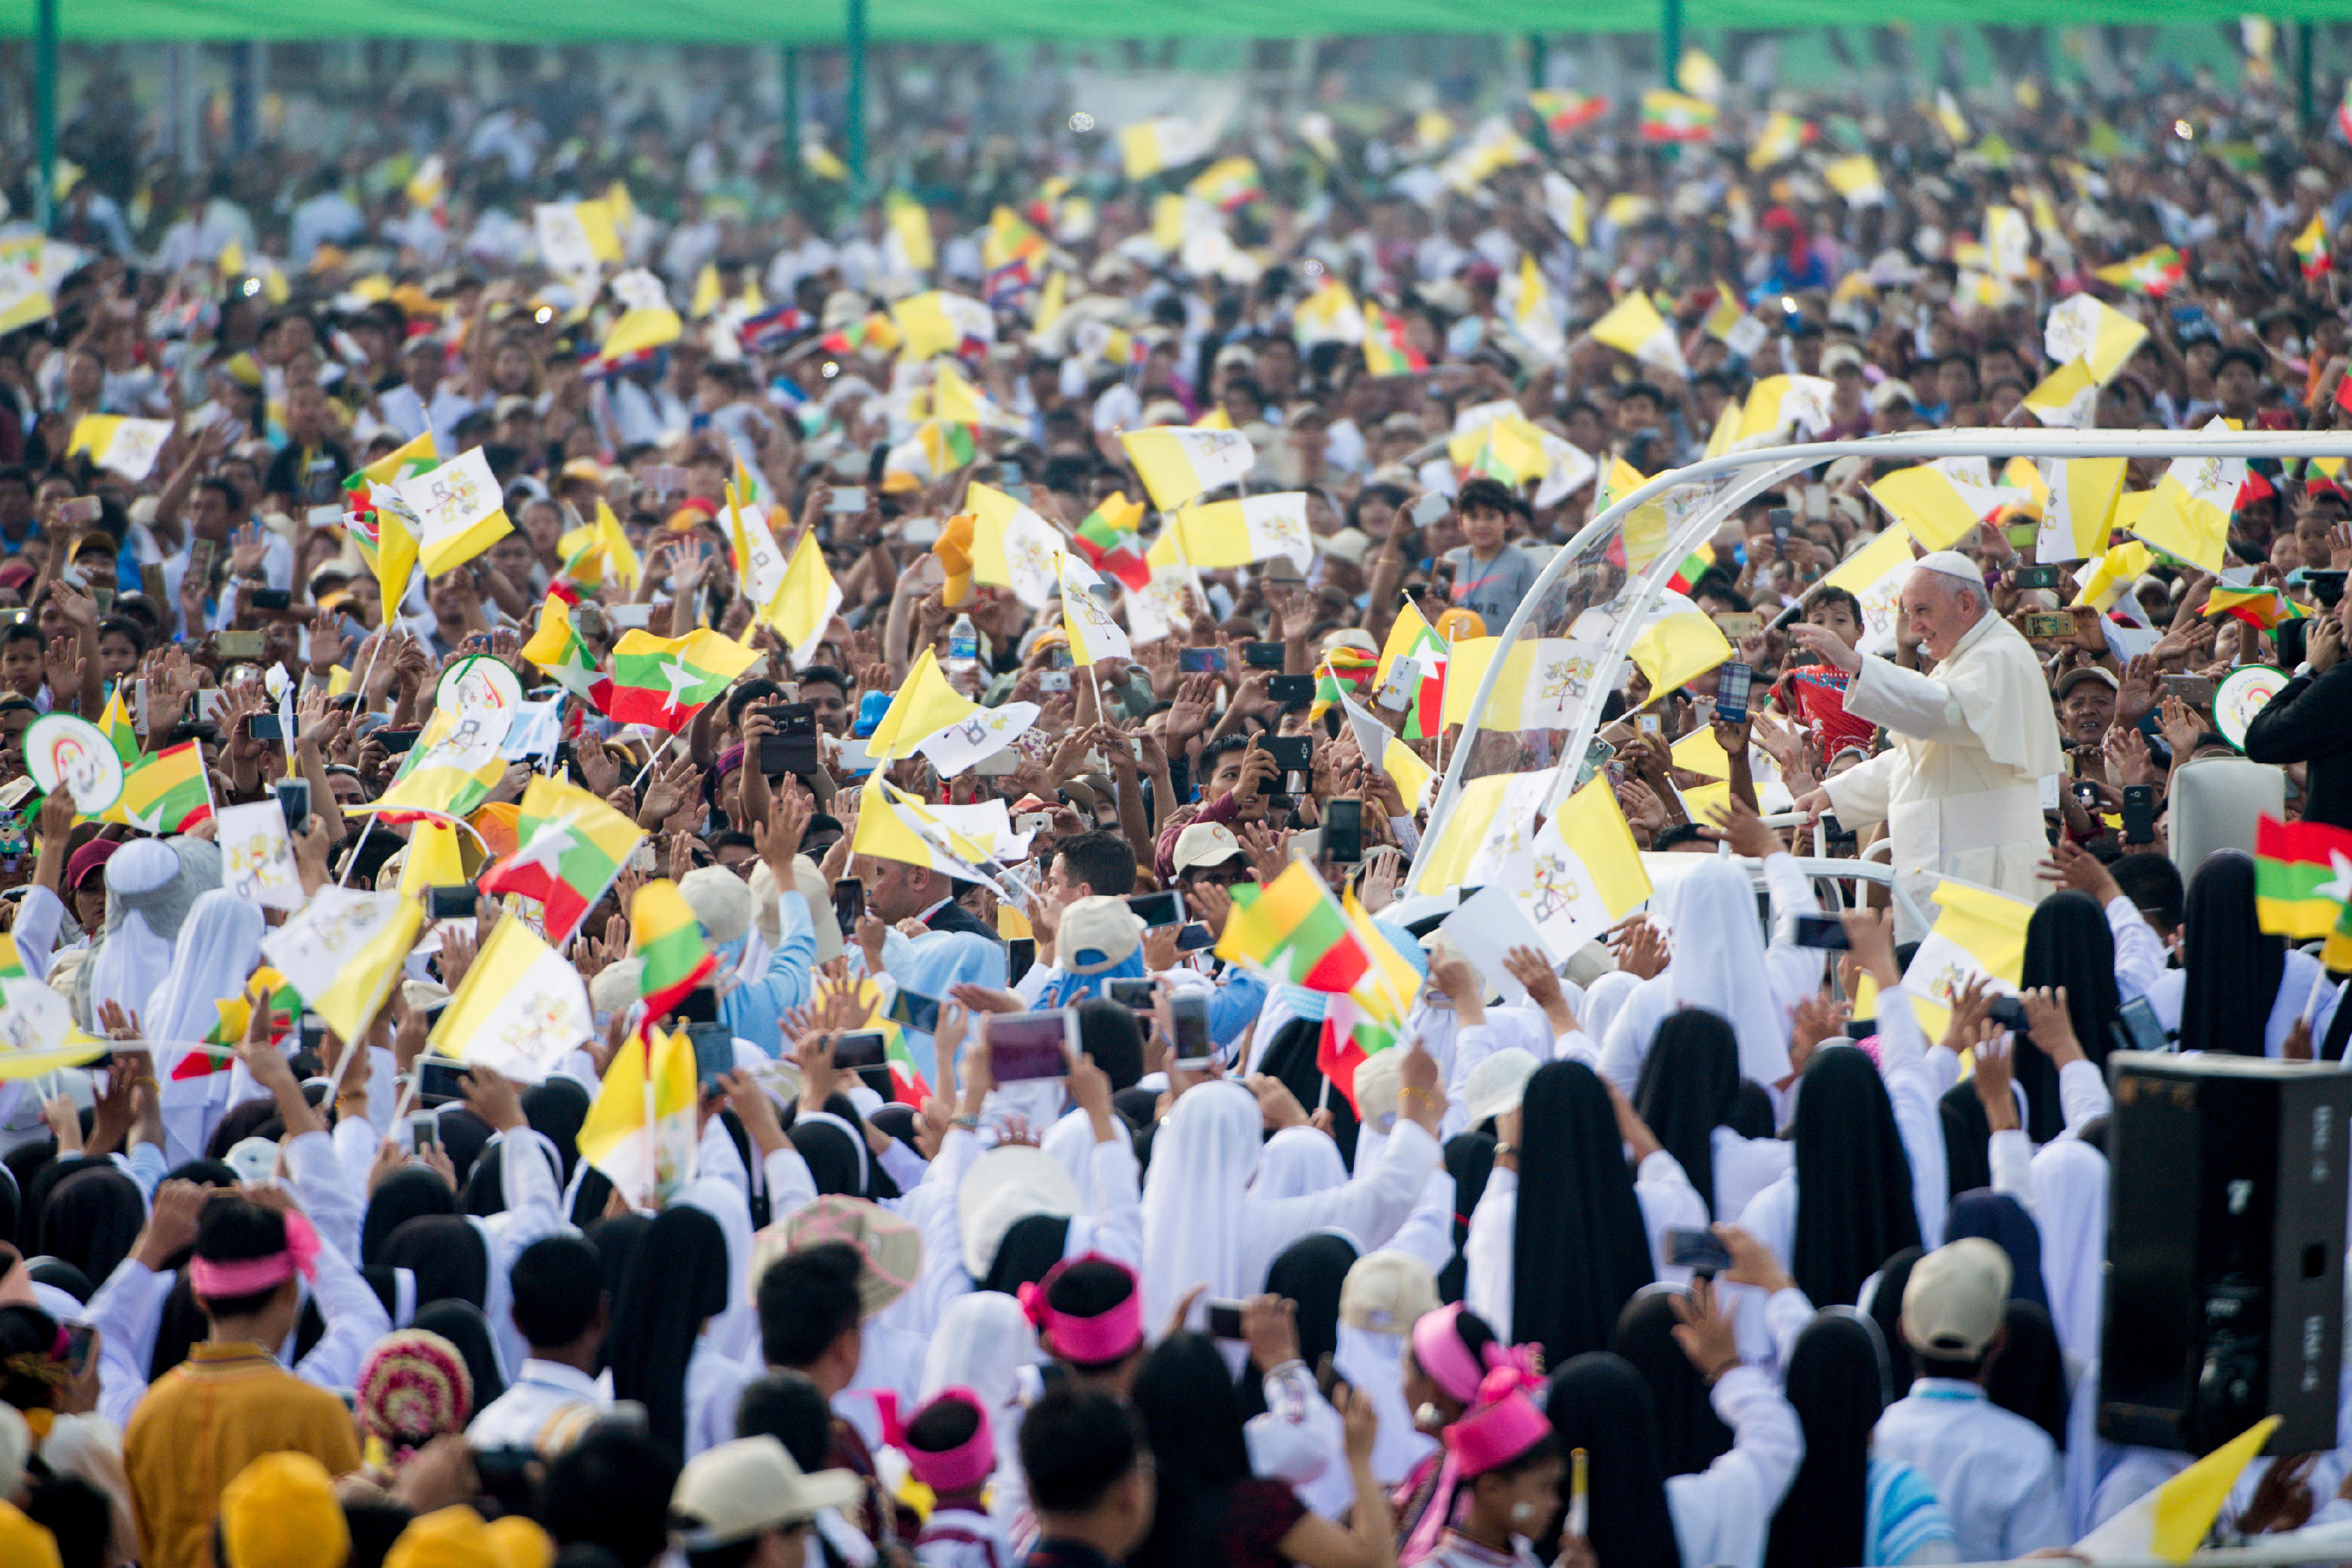 Messe au au Kyaikkasan Ground de Yangon, Myanmar © L'Osservatore Romano